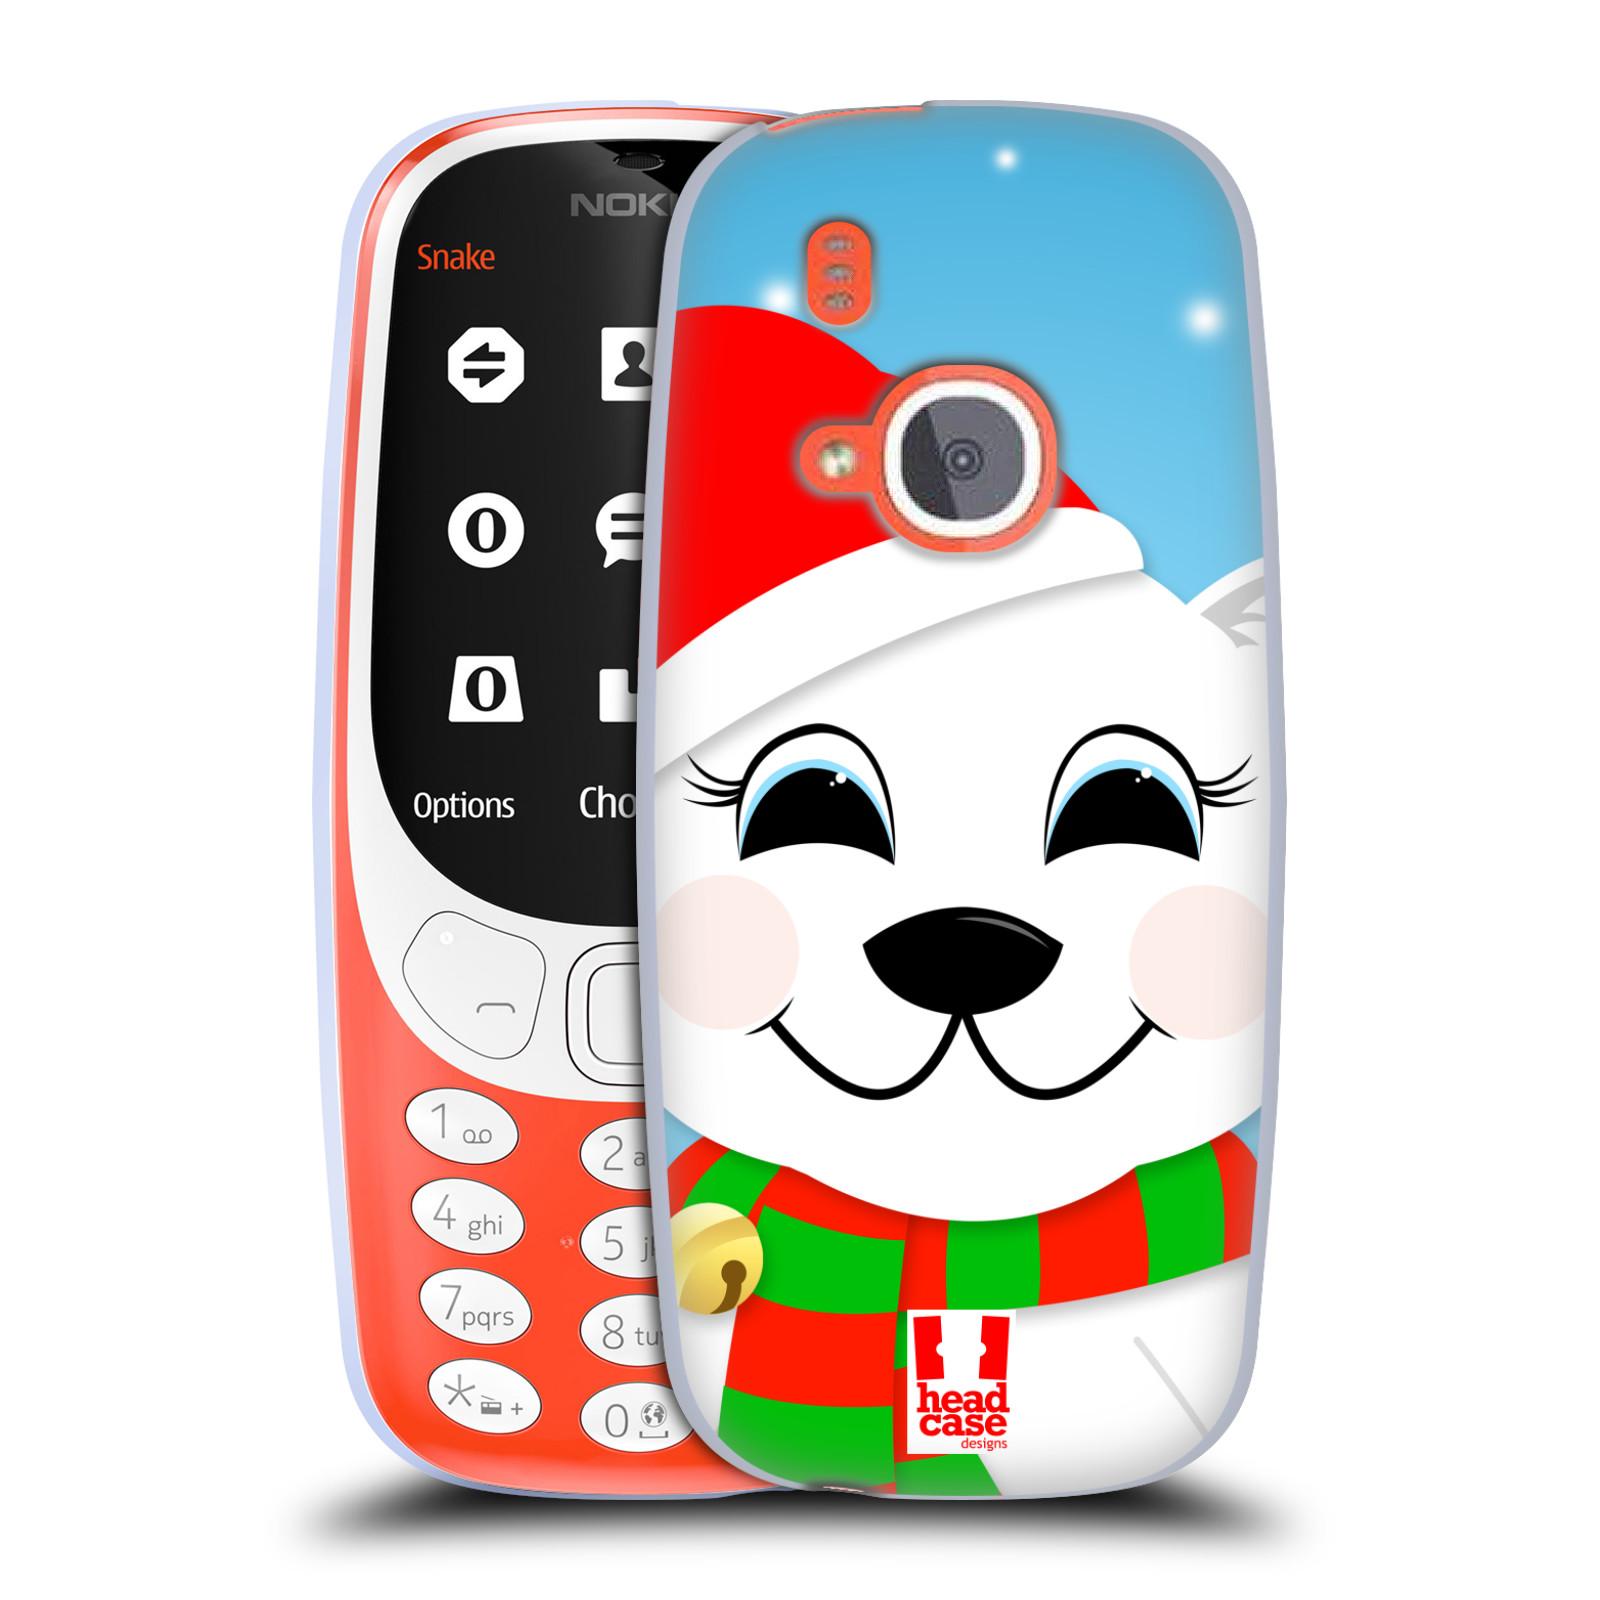 Silikonové pouzdro na mobil Nokia 3310 - Head Case - VÁNOCE POLÁRNÍ MÉĎA (Silikonový kryt či obal na mobilní telefon Nokia 3310 (2017) s motivem VÁNOCE POLÁRNÍ MÉĎA)